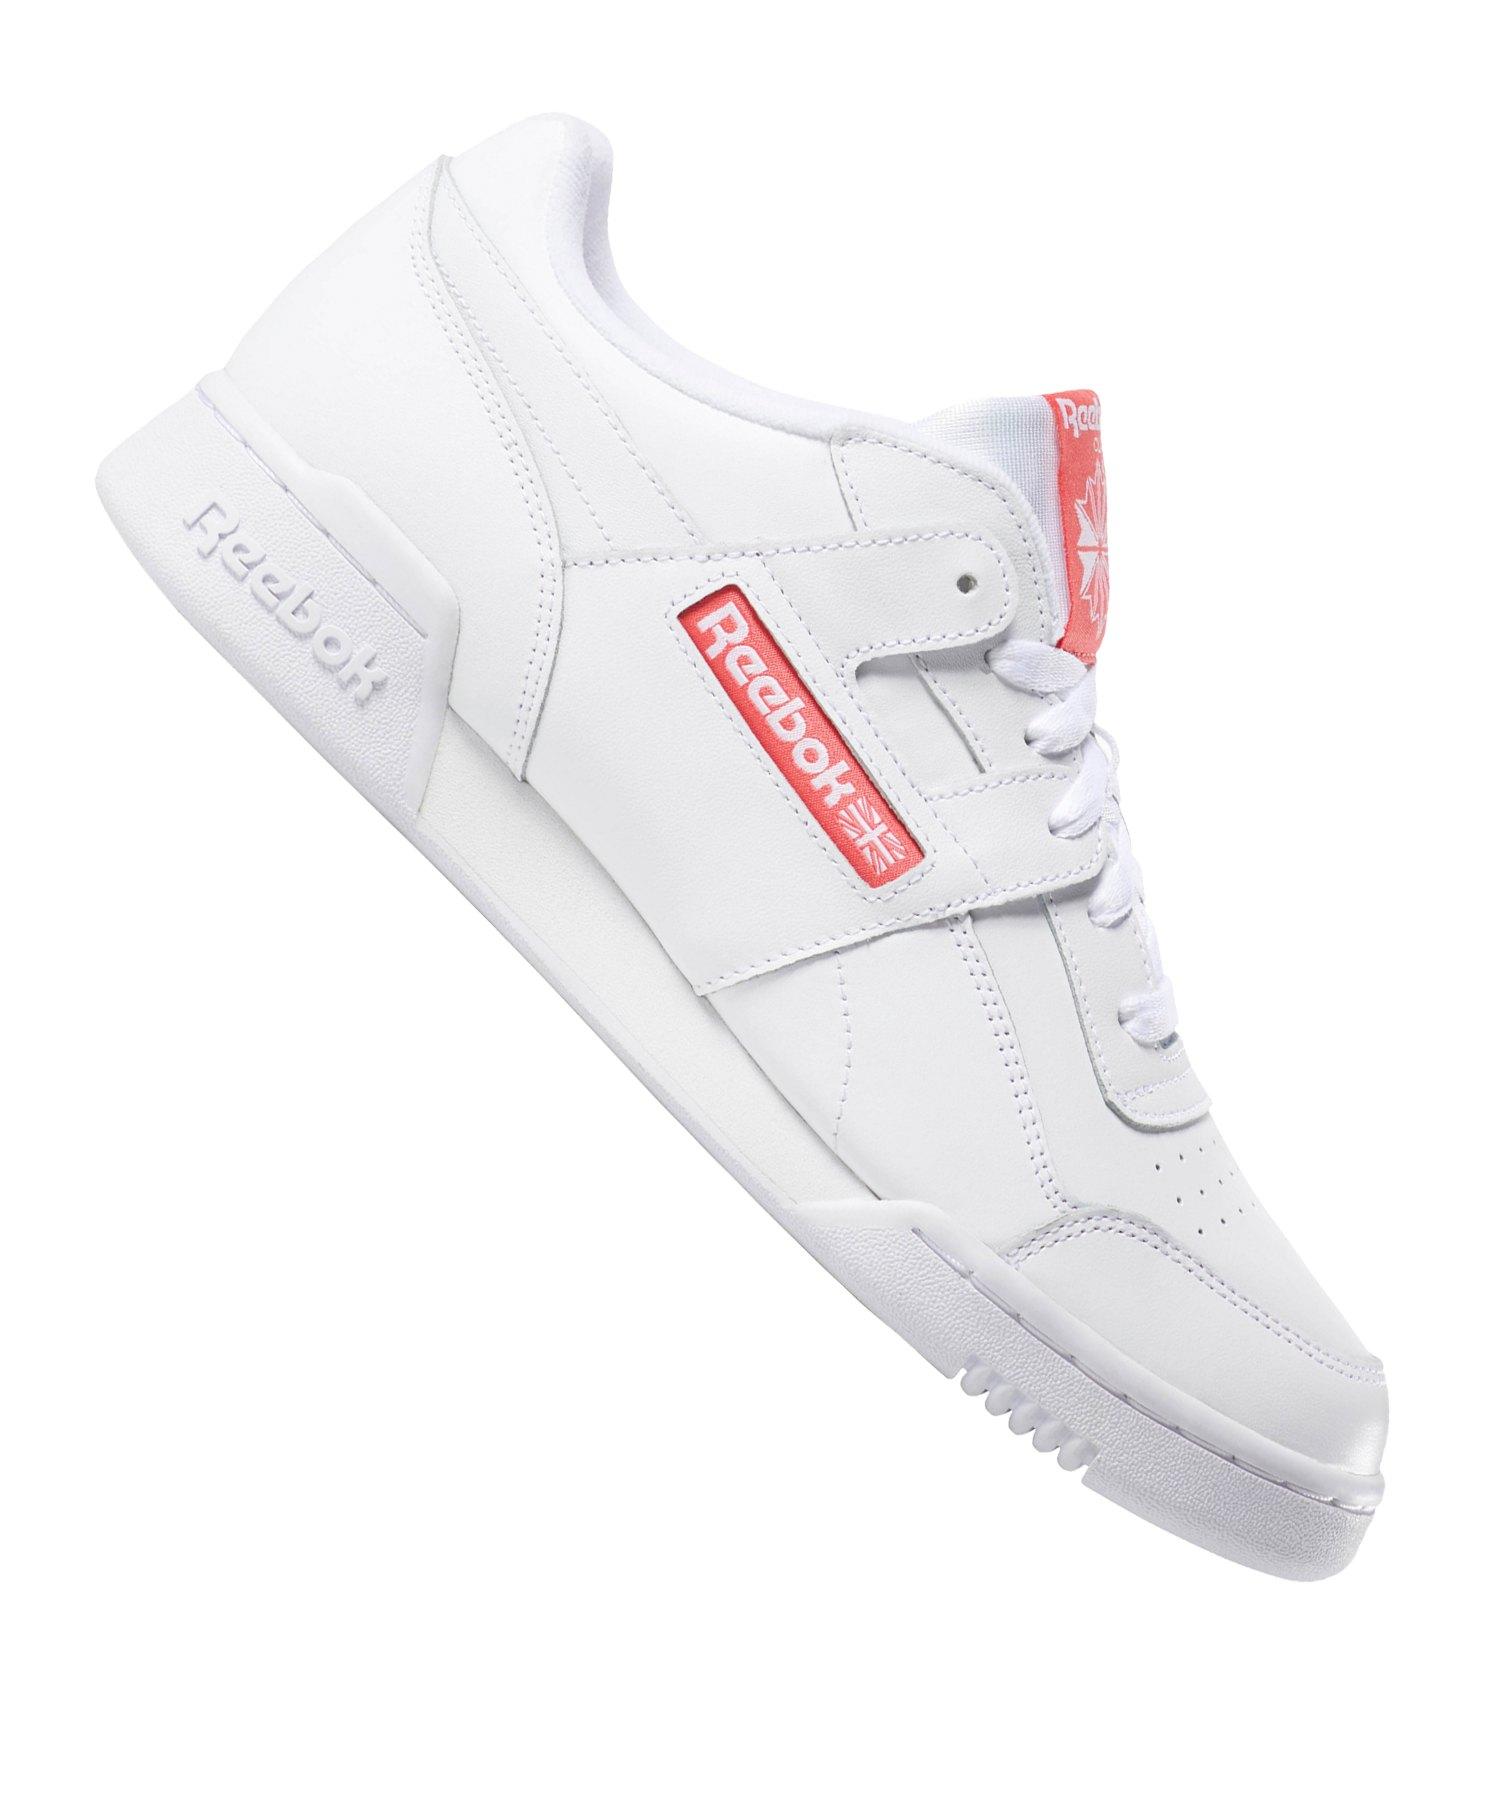 Reebok Workout Plus MU Sneaker Weiss Pink - weiss